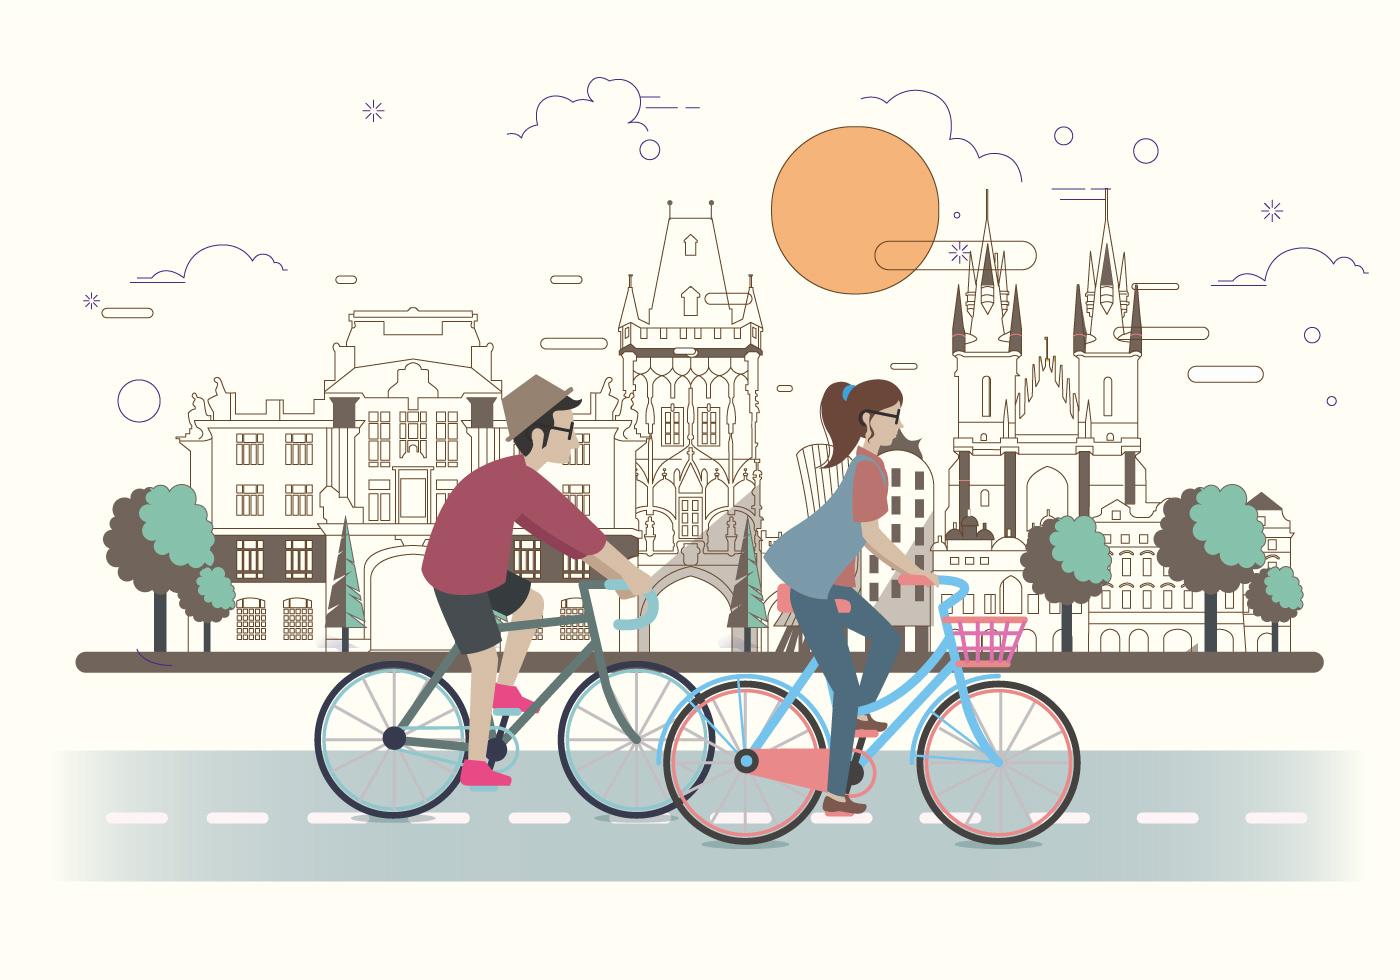 riding-a-bike-vector.jpg